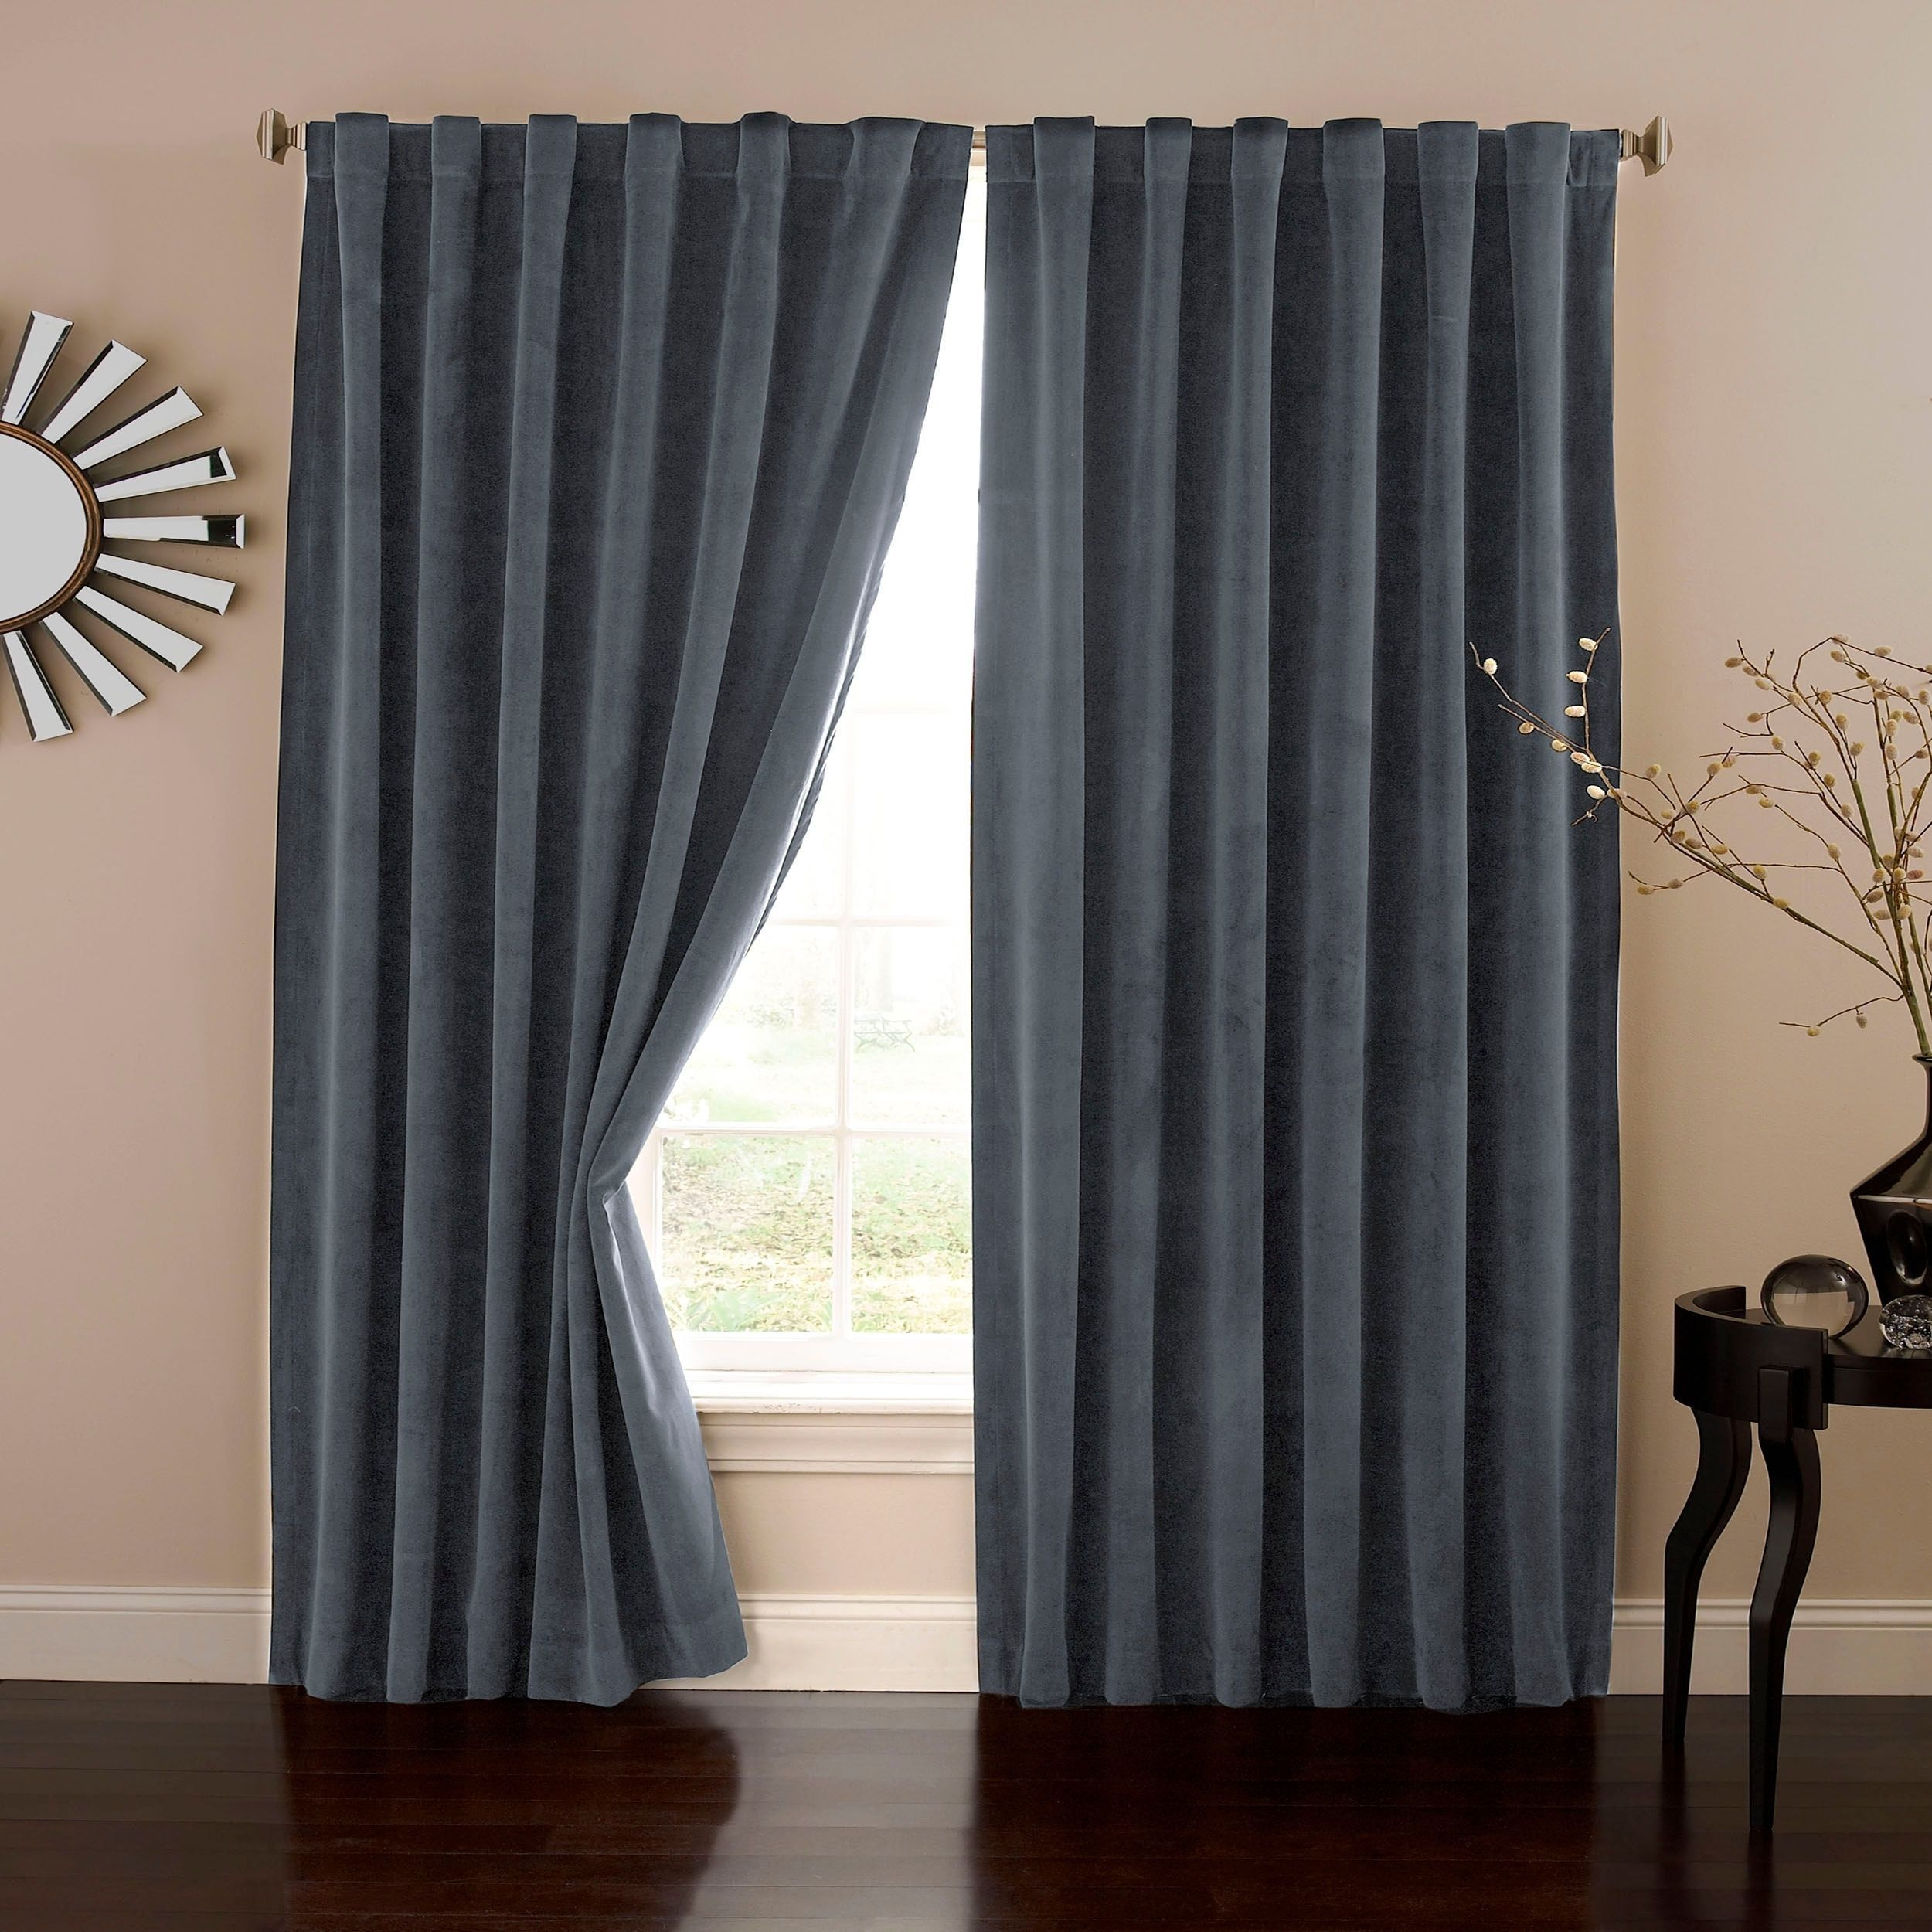 Absolute zero velvet blackout home theater curtain panel stone blue